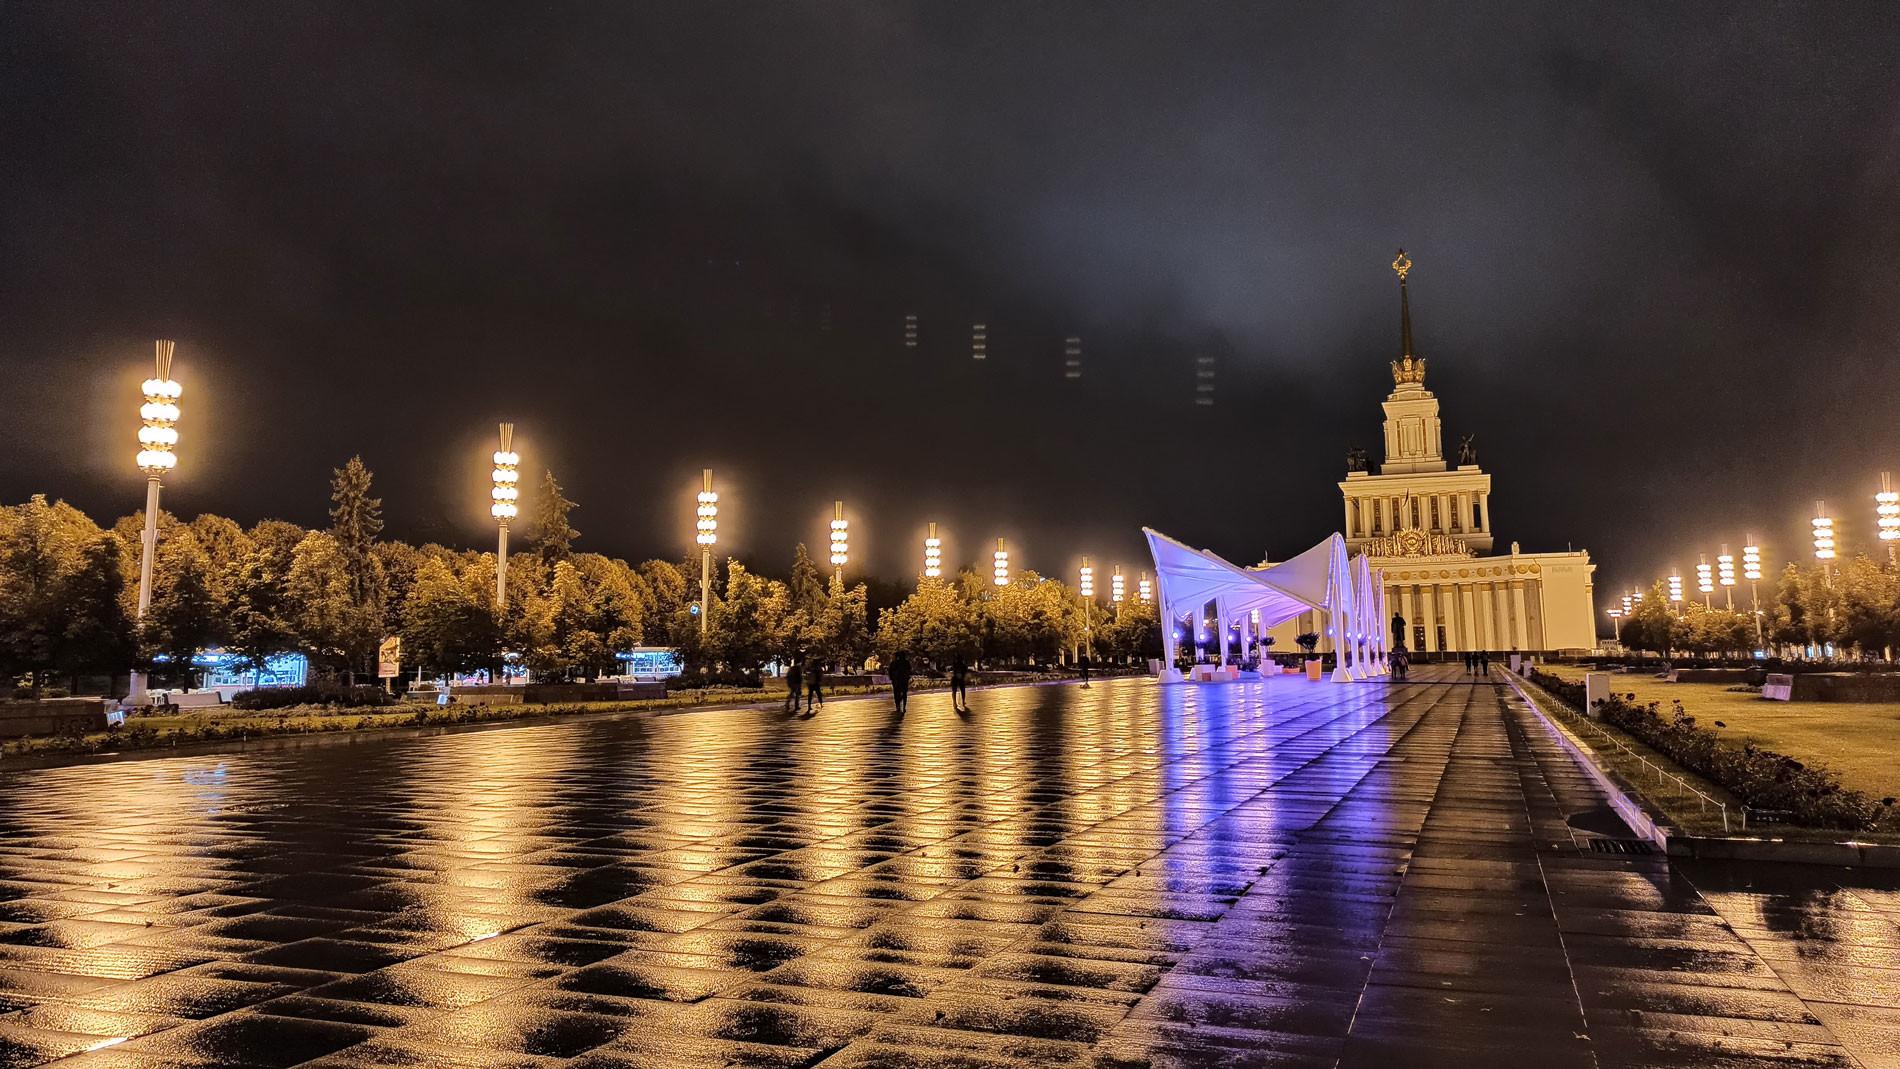 <p>Фото ©LIFE / Кильдюшкин Роман</p>